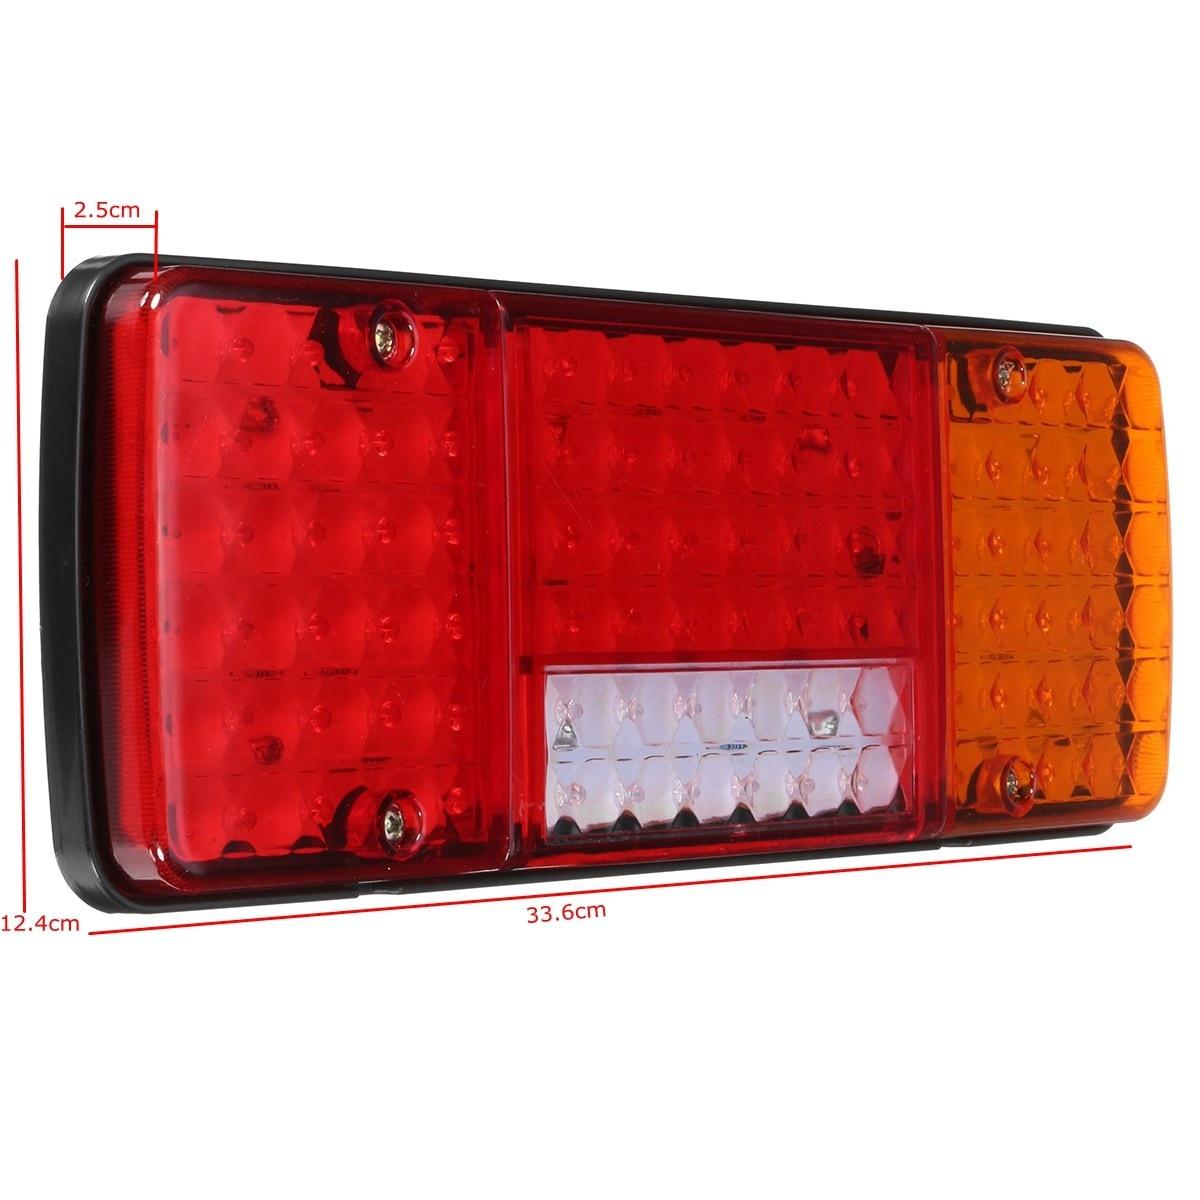 2Pcs 12V LED Rear Tail Lights 92LED Reverse Lamp 5 Function For Trailer Caravan Truck Lorry